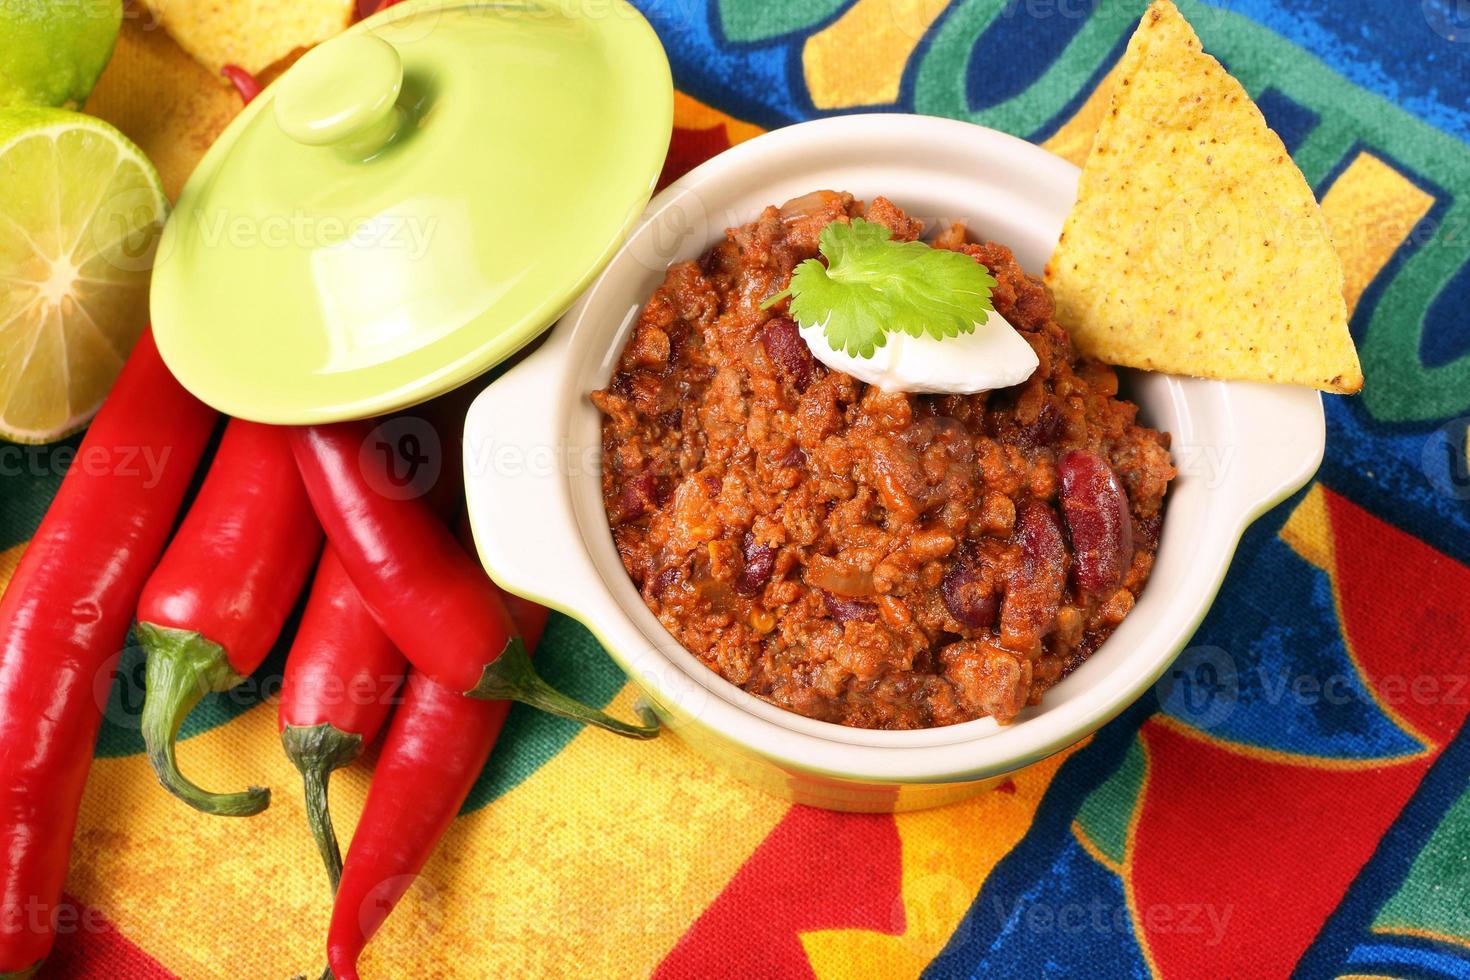 chili con carne och nachos foto